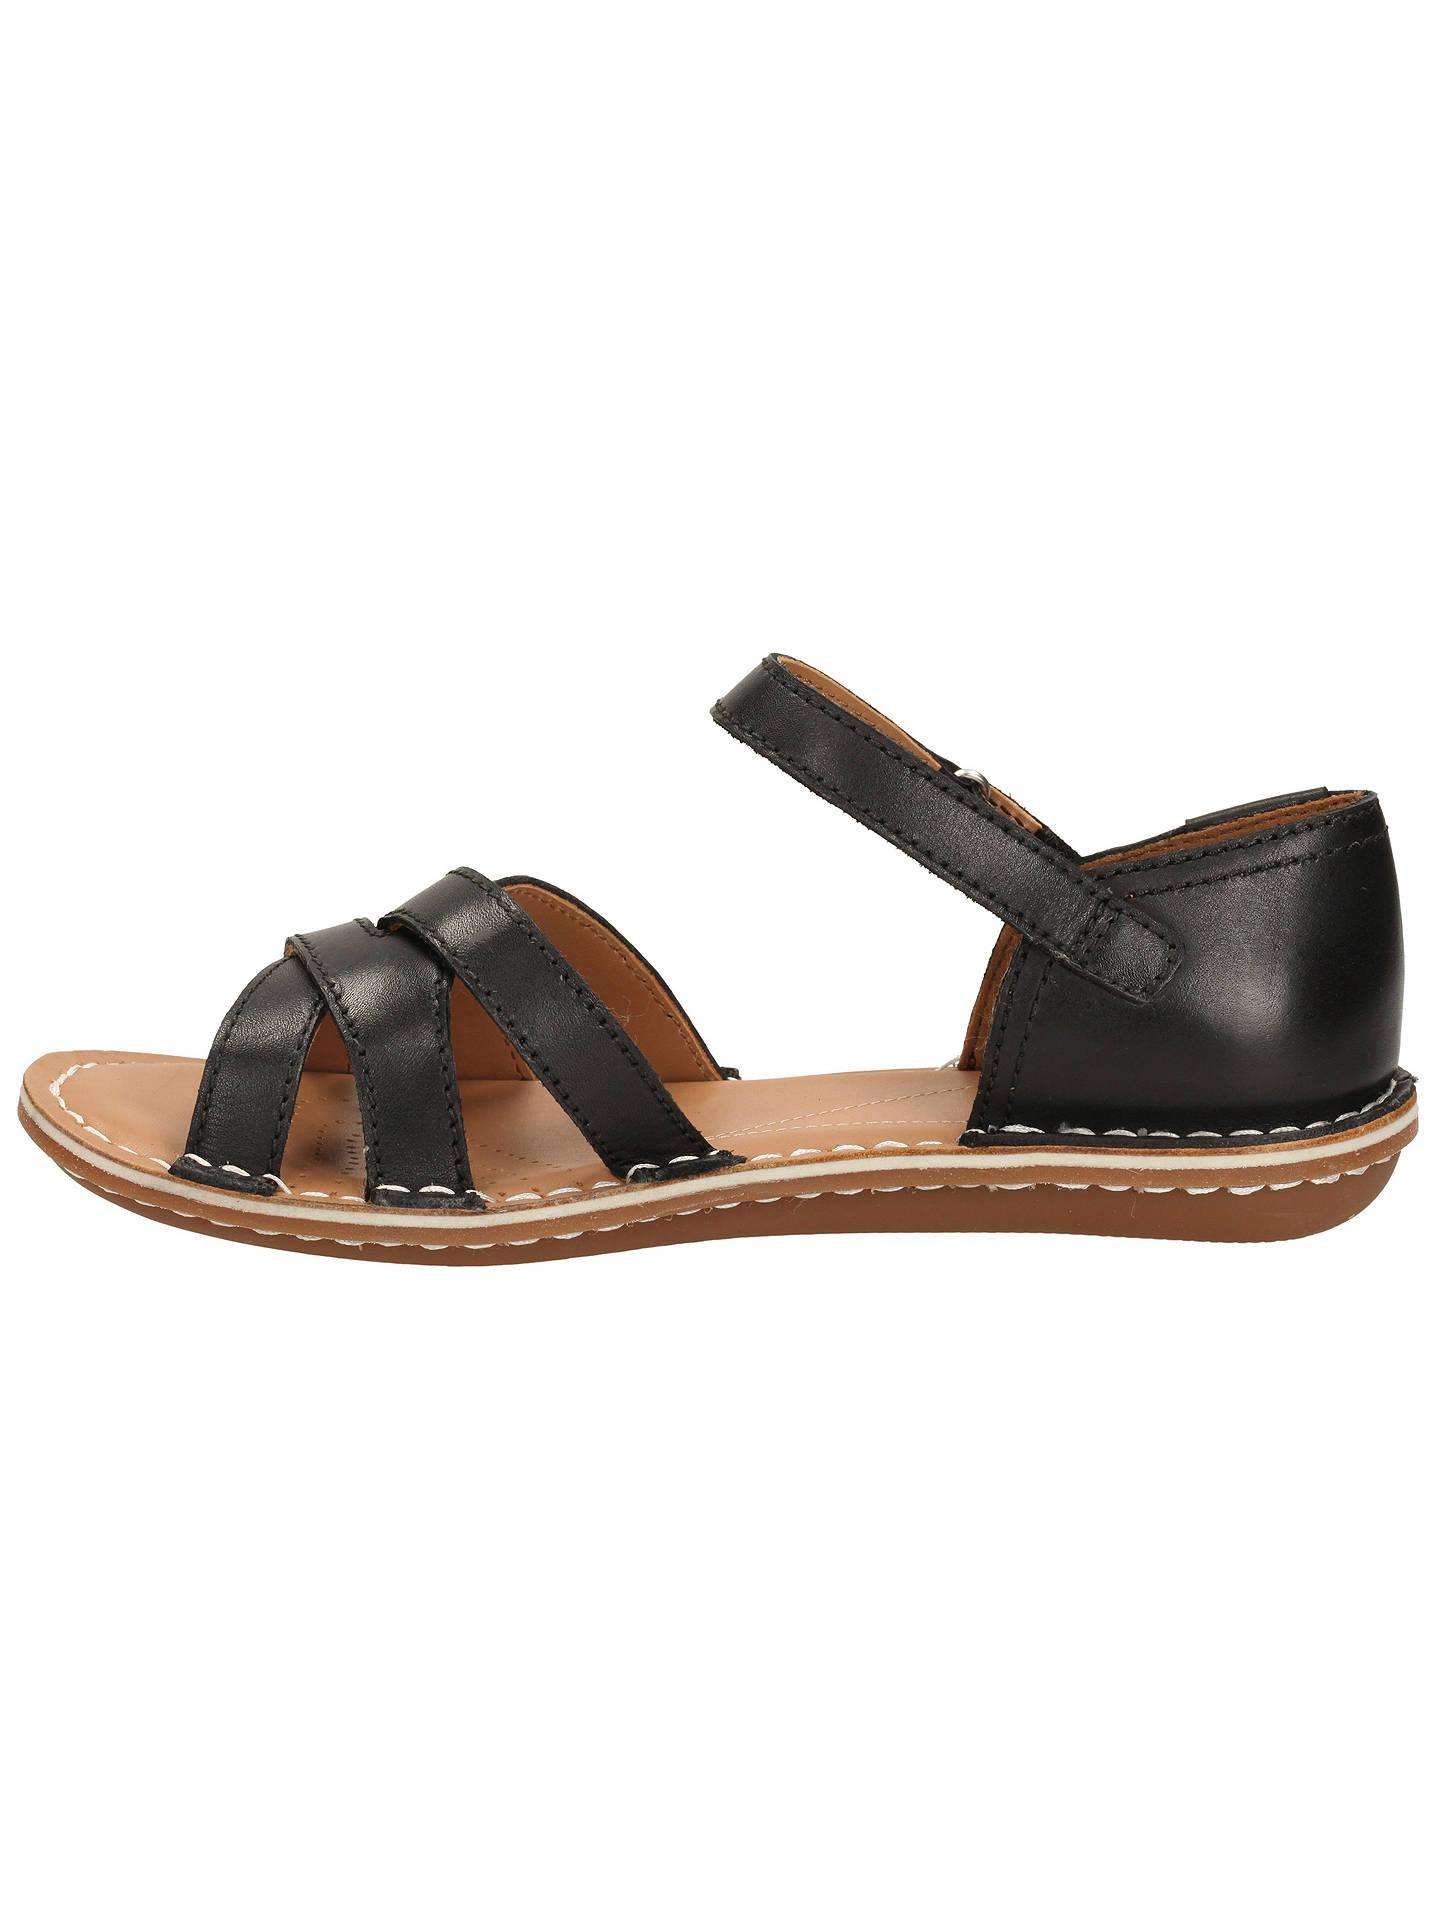 17f73460973b Clarks Tustin Sahara Leather Sandals at John Lewis   Partners